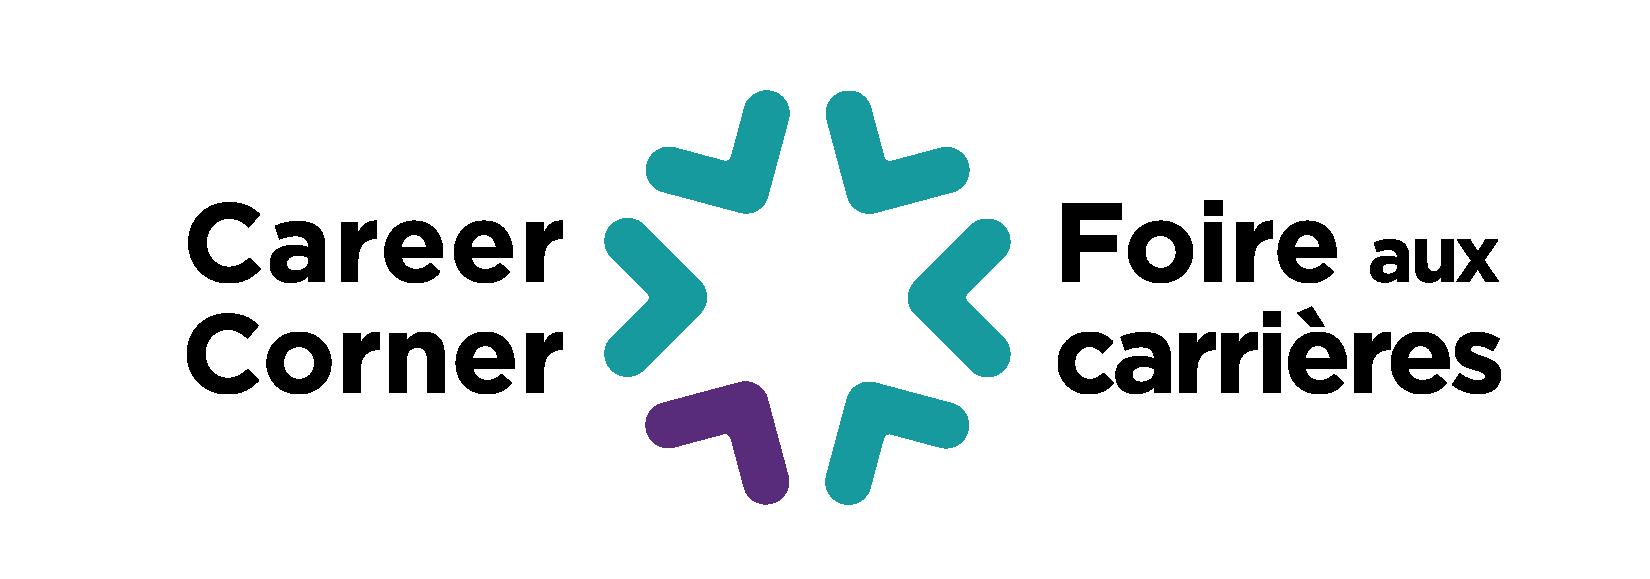 "Teal and purple logo of the Federation's Career Corner event series, with text reading ""Career Corner"". En français on voit les mots « Foire aux carrières » ."